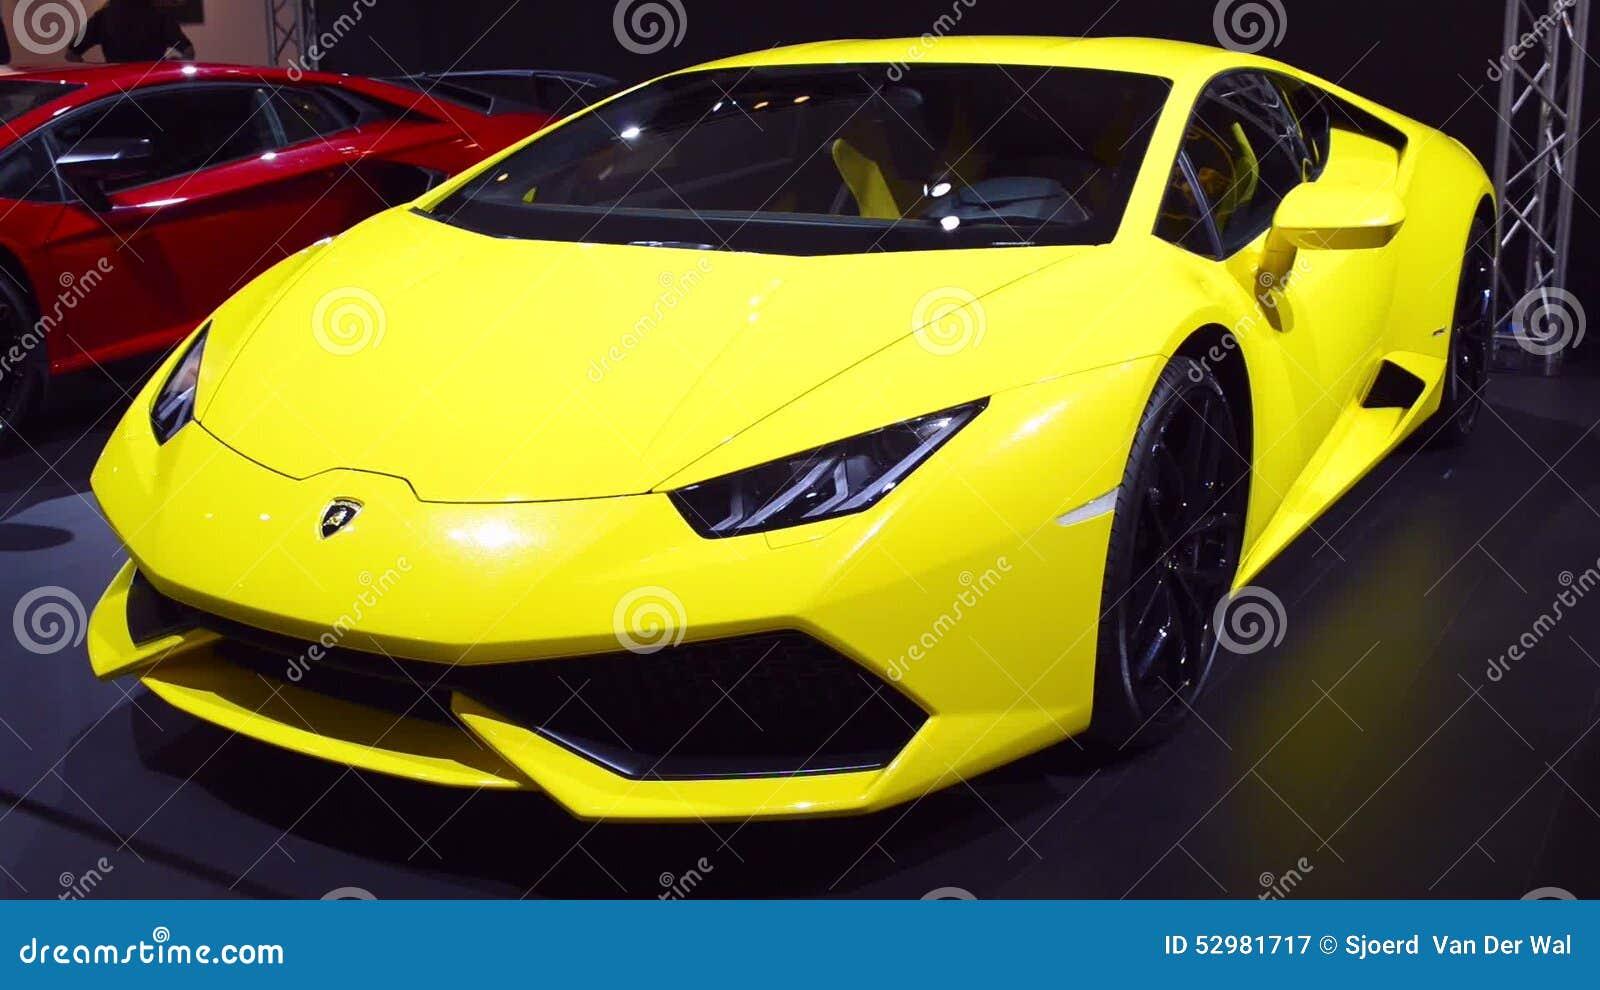 Lamborghini Huracan Sports Car Front View Stock Video Video Of